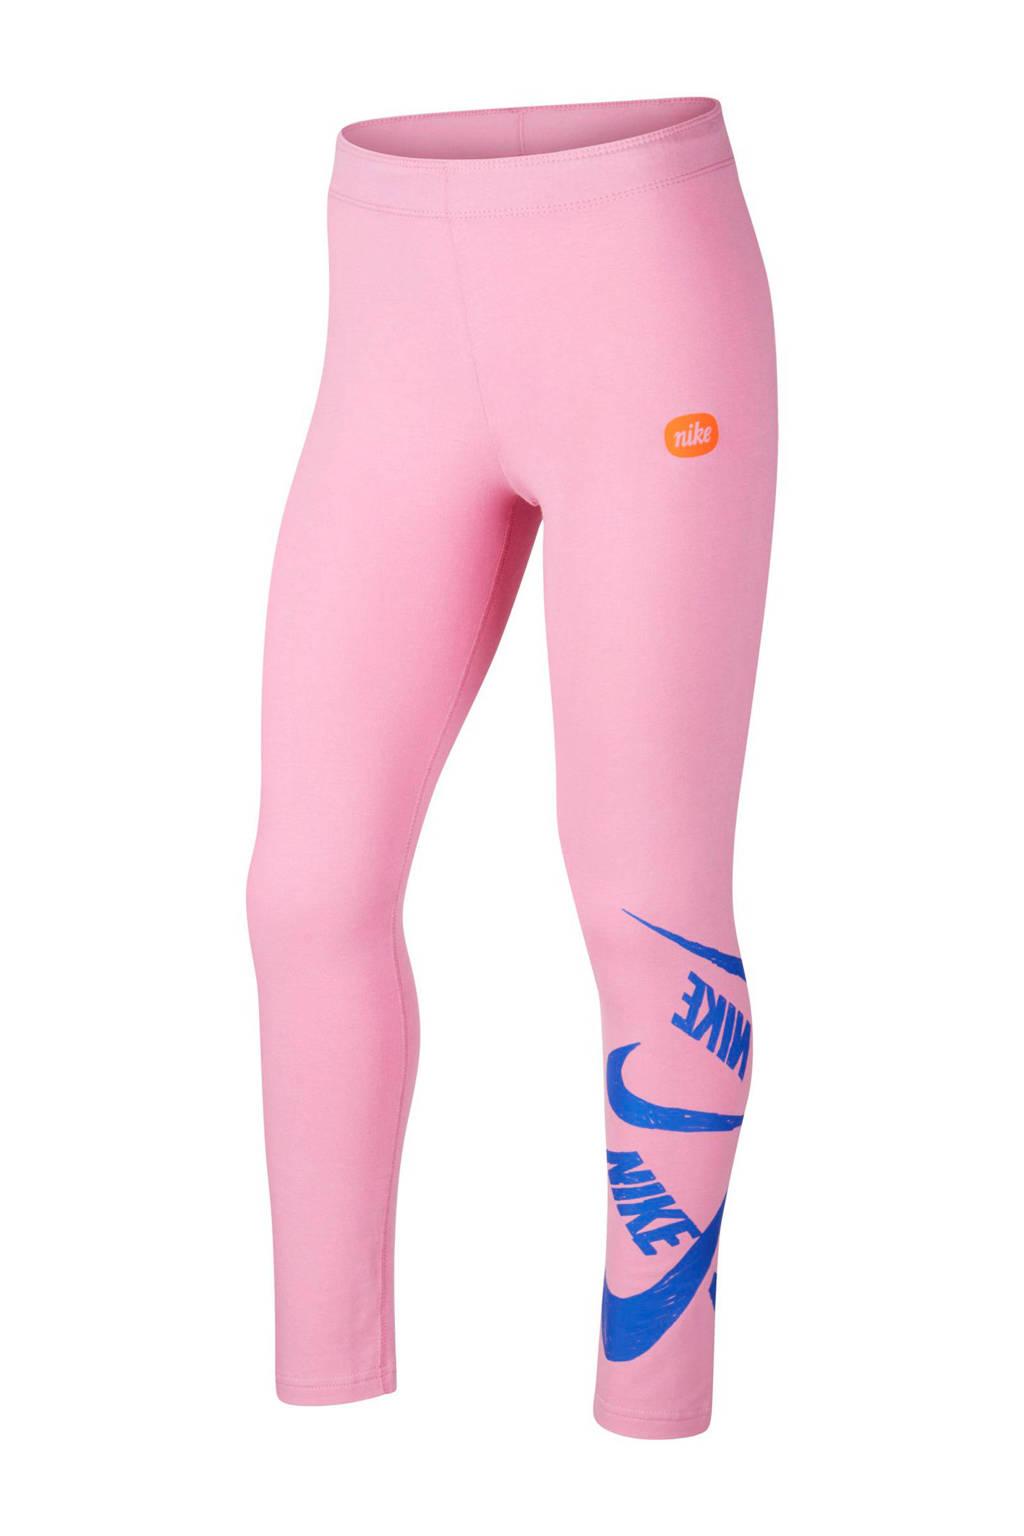 Nike legging roze, Roze